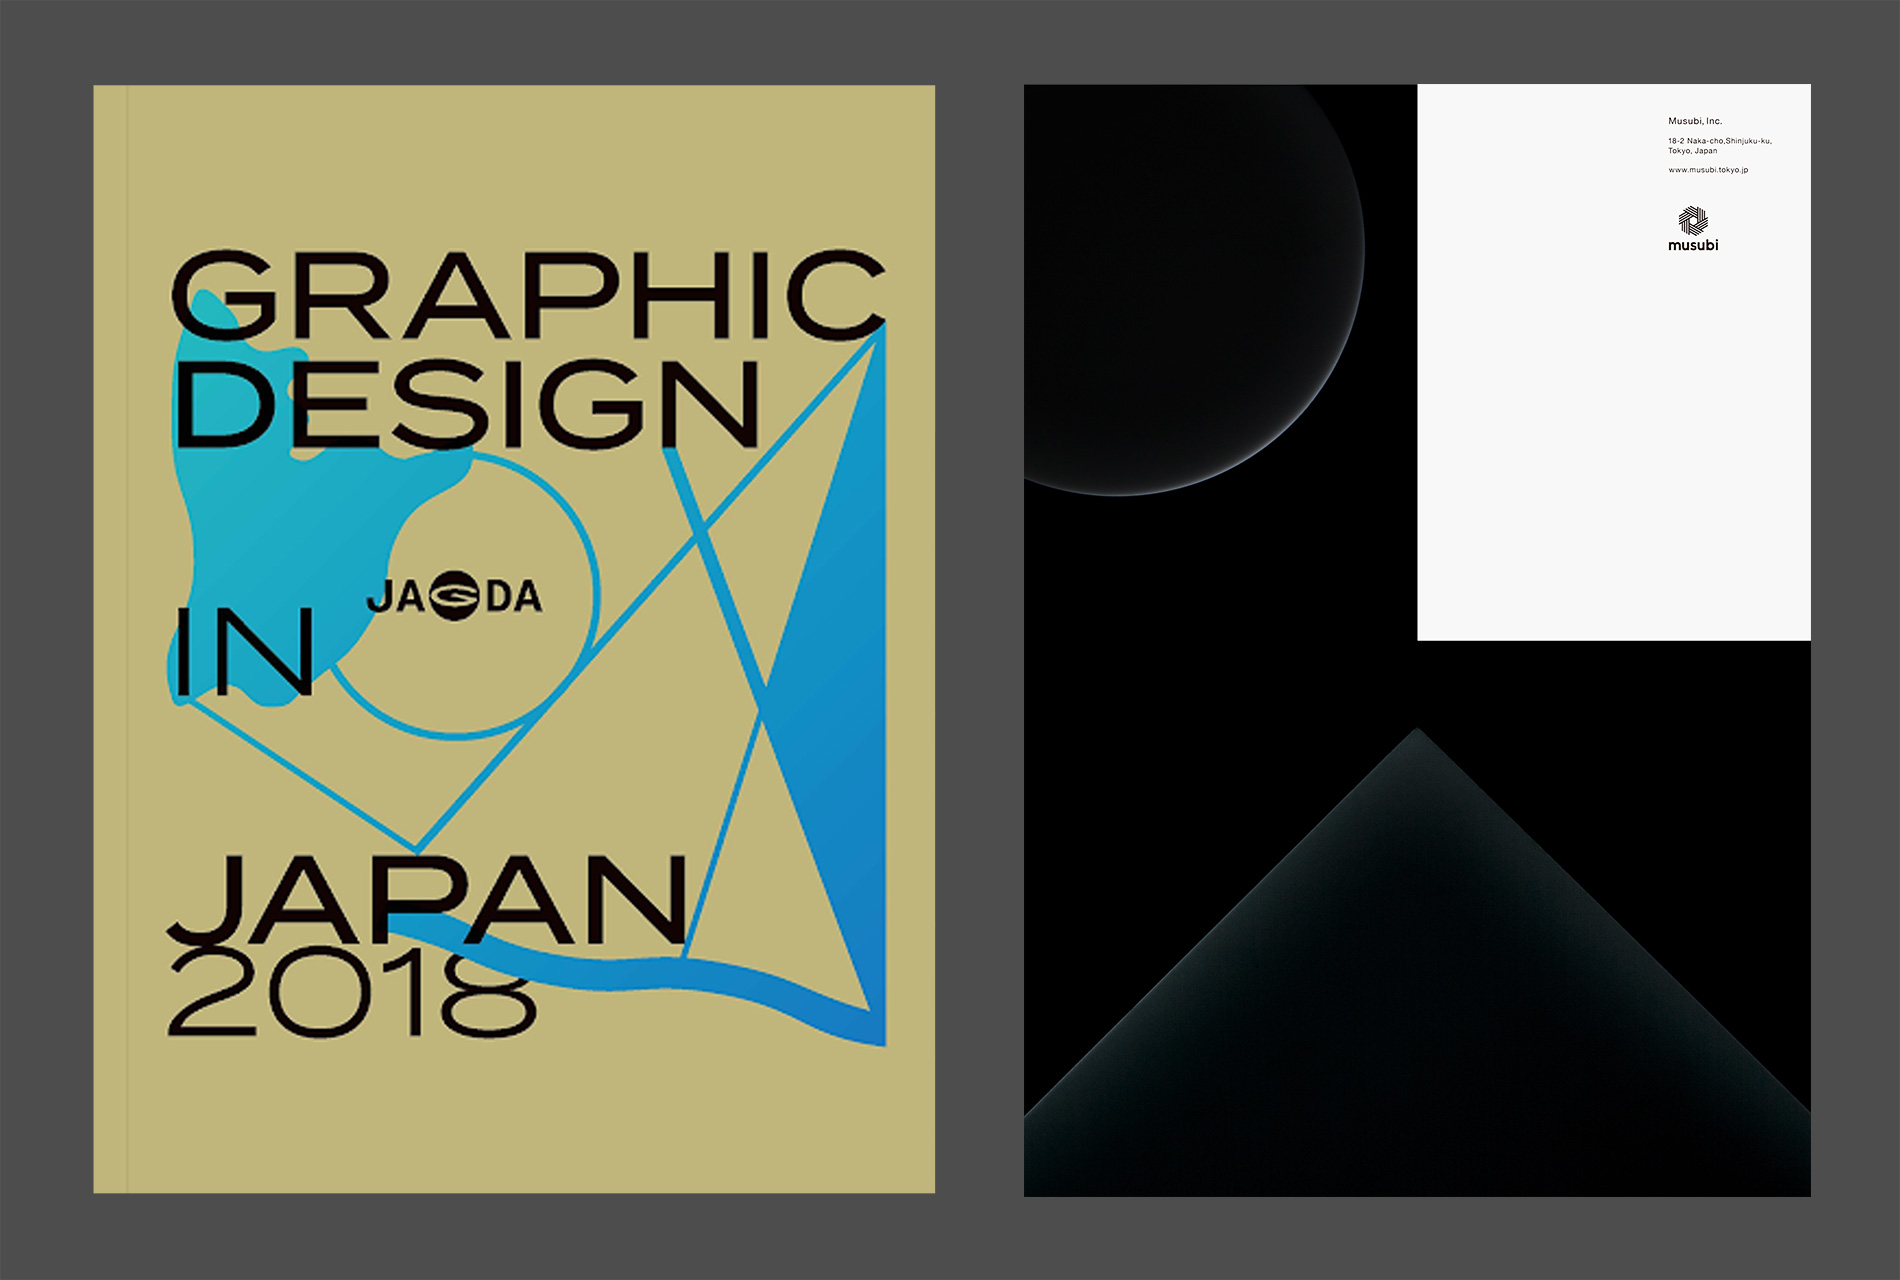 Graphic Design in Japan 2018 musubi Inc.ポスター